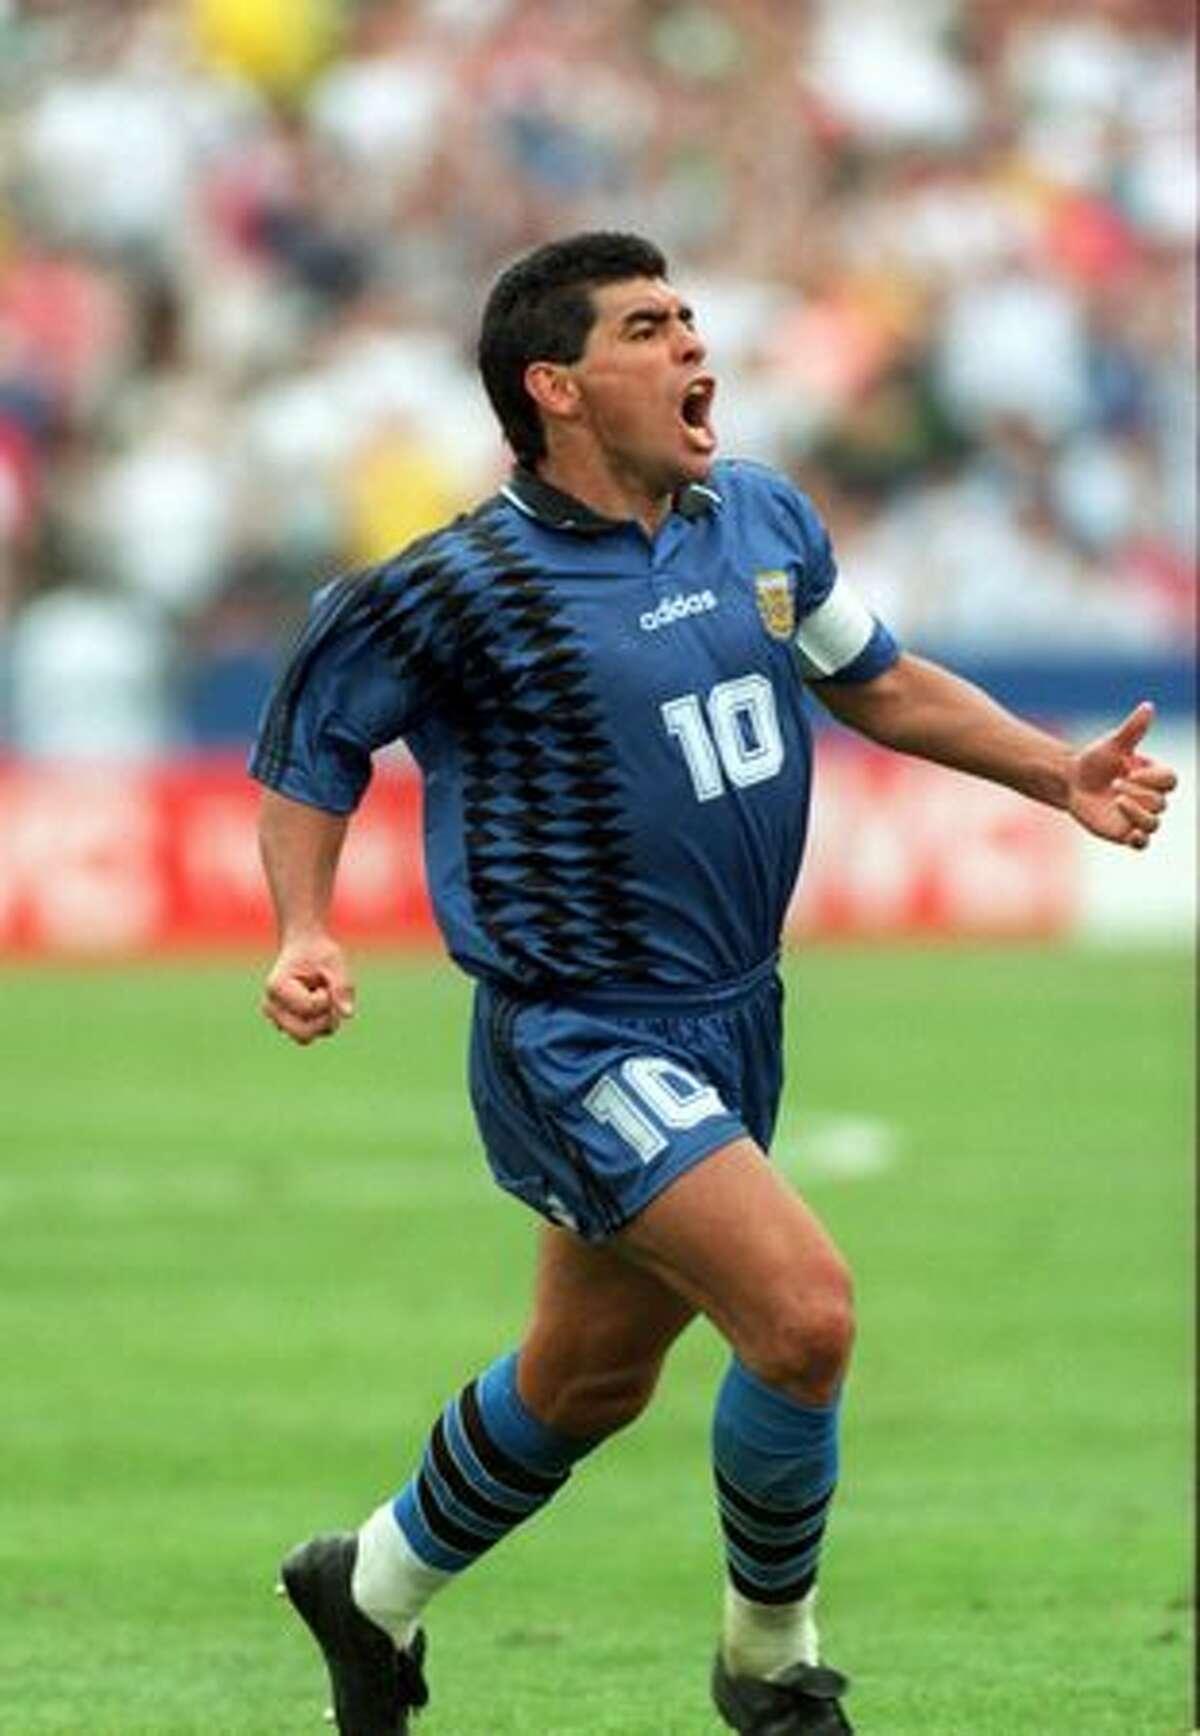 1994: Diego Maradona of Argentina celebrates scoring Argentina's third goal en route to defeating Greece 4-0 Foxboro Stadium in Massachusetts.